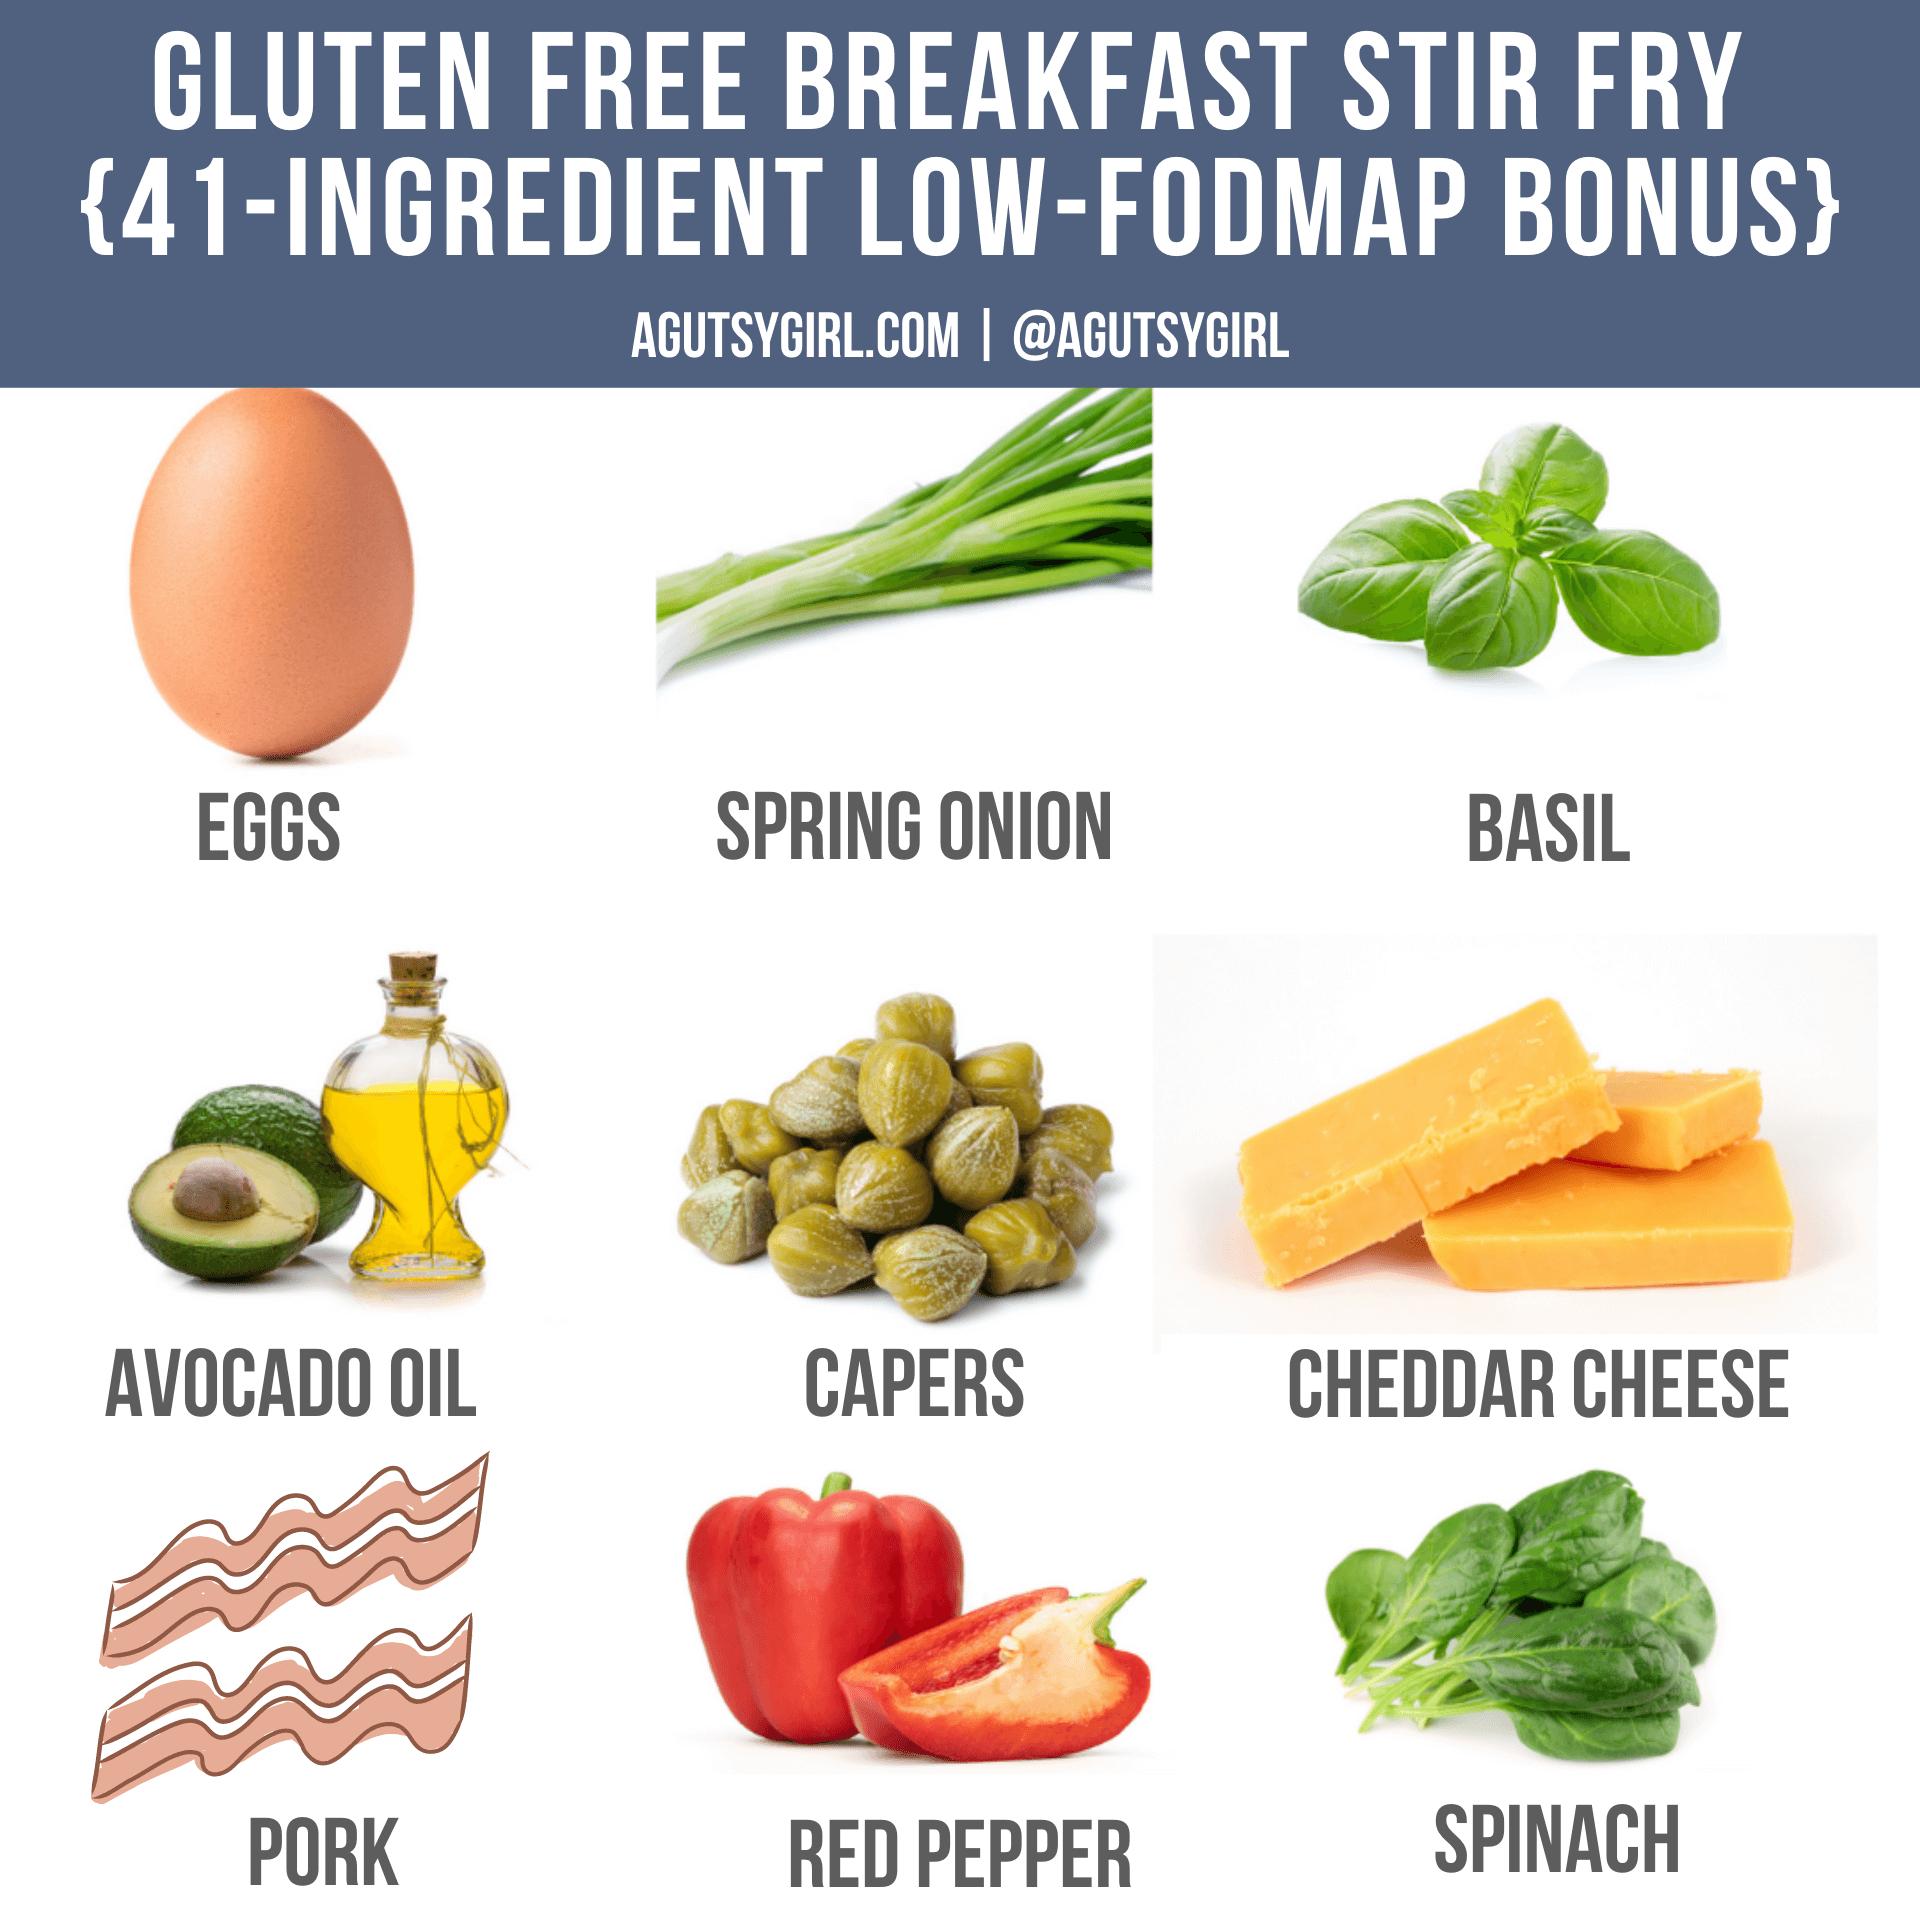 Gluten Free Breakfast Stir Fry Low-FODMAP Bonus agutsygirl.com #breakfastrecipes #sibo #guthealth #glutenfree